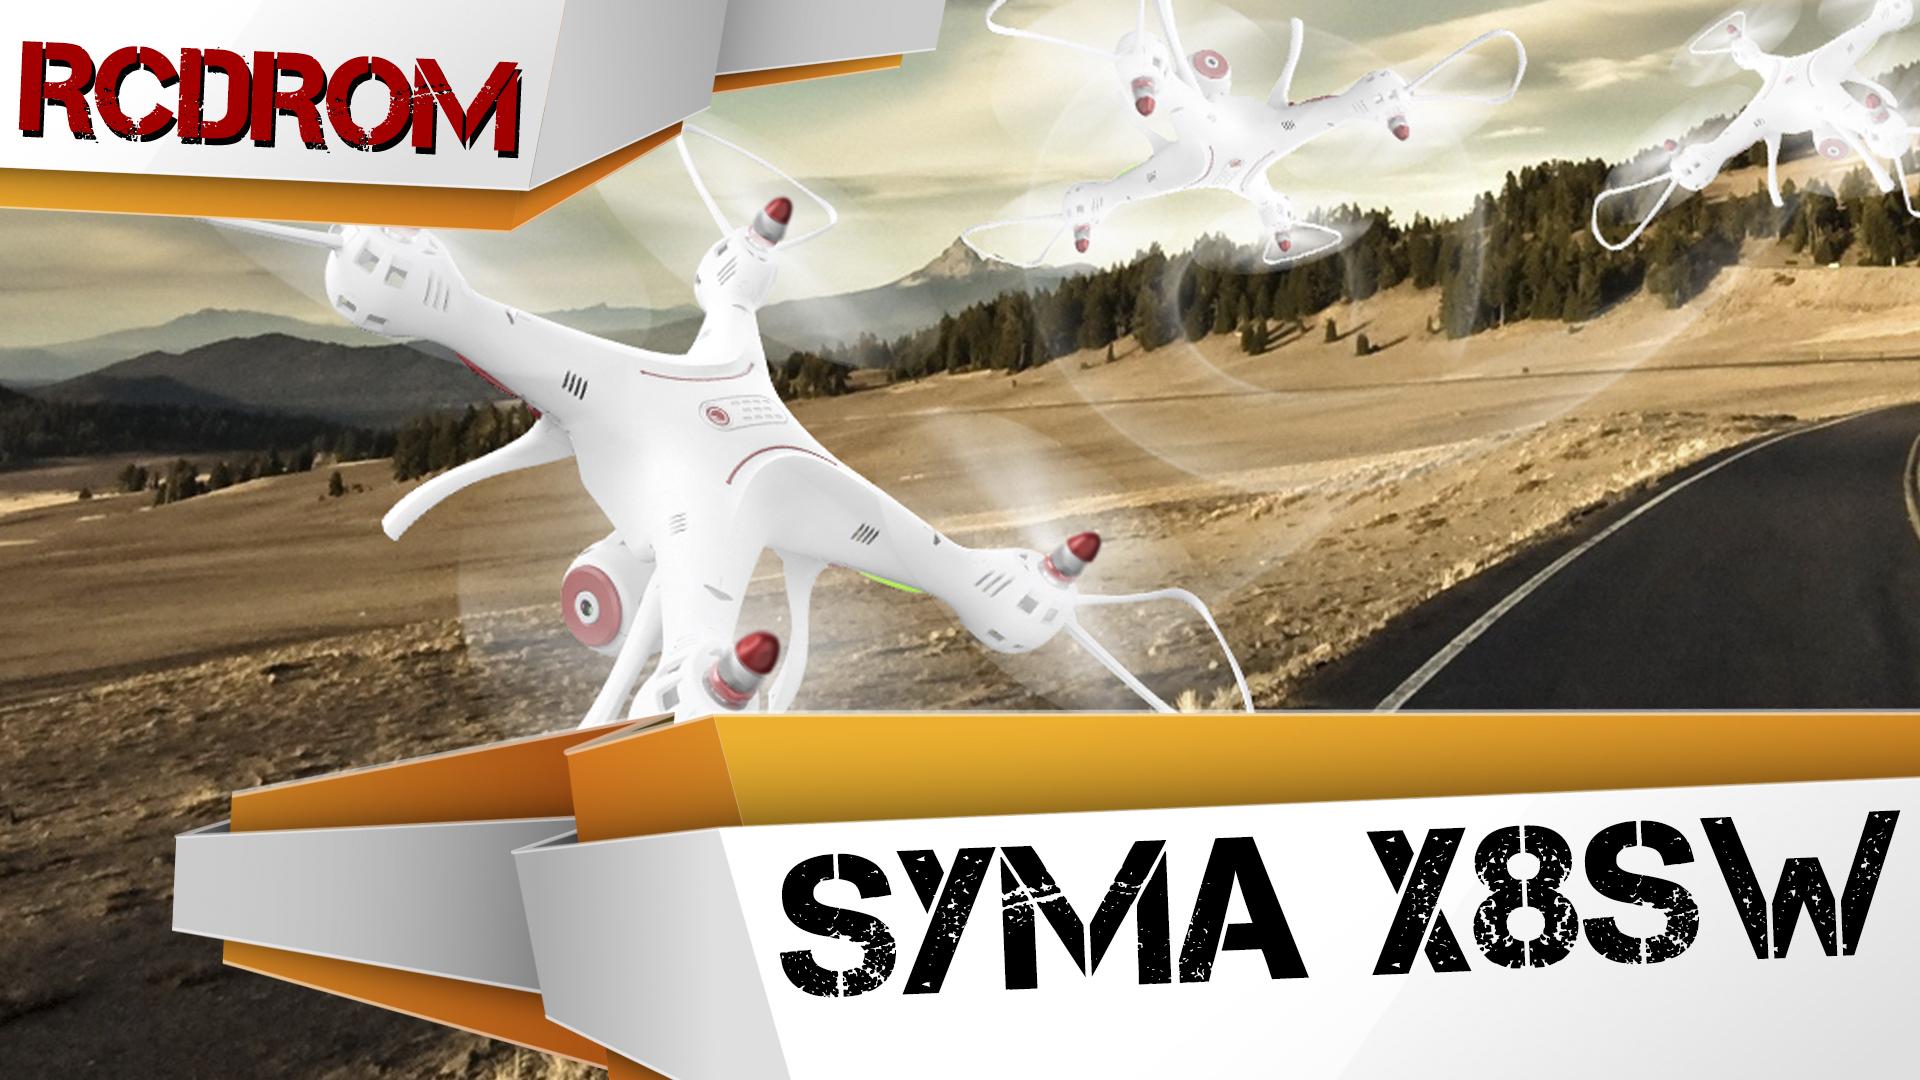 http://xn--80aqahhiry1c.xn--p1ai/images/upload/SYMA.jpg